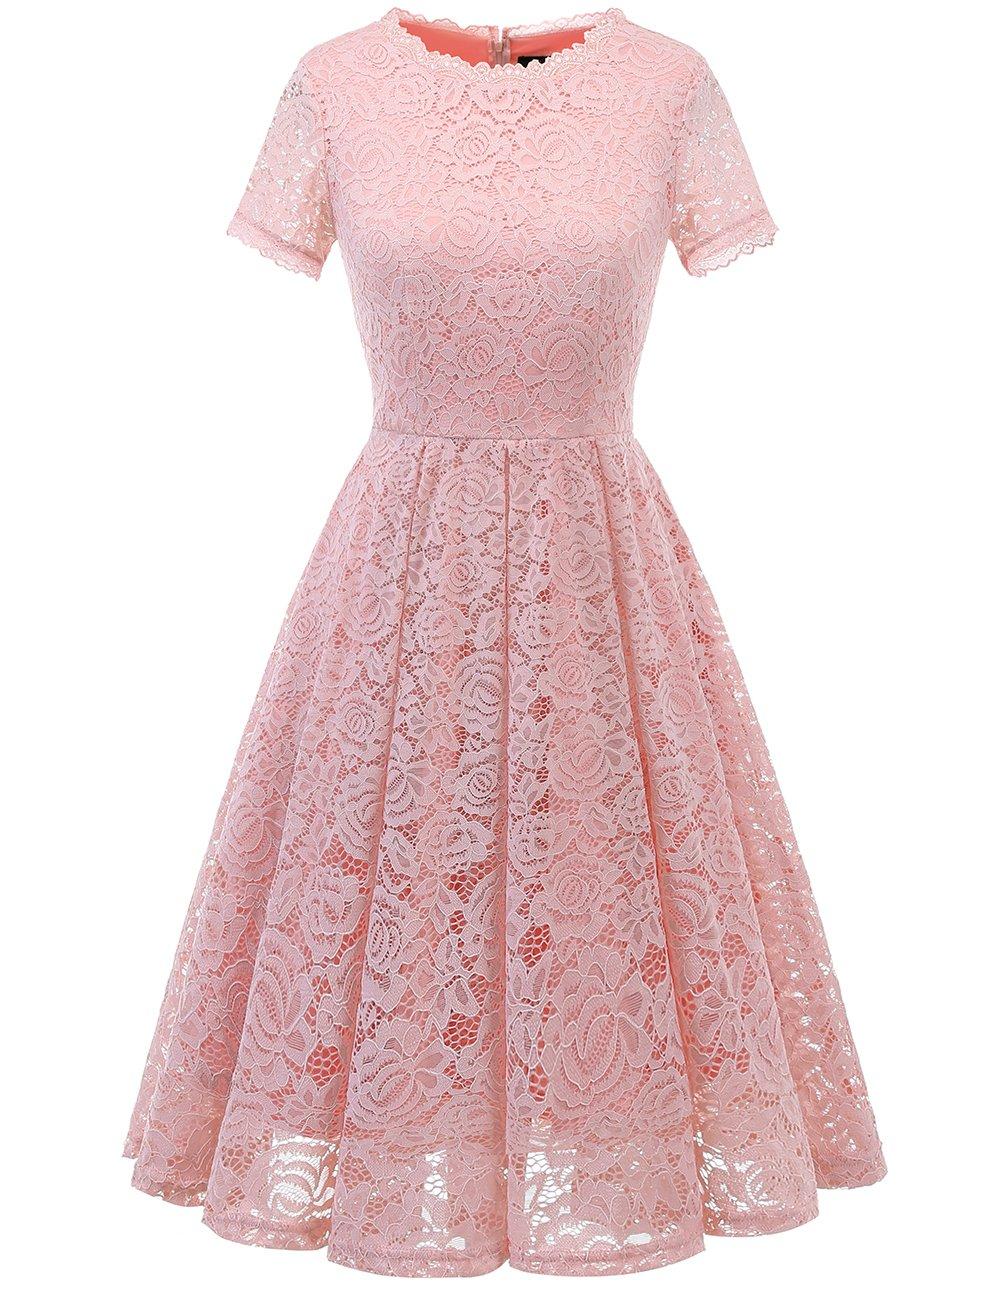 DRESSTELLS Women's Bridesmaid Vintage Tea Dress Floral Lace Cocktail Formal Swing Dress Blush M